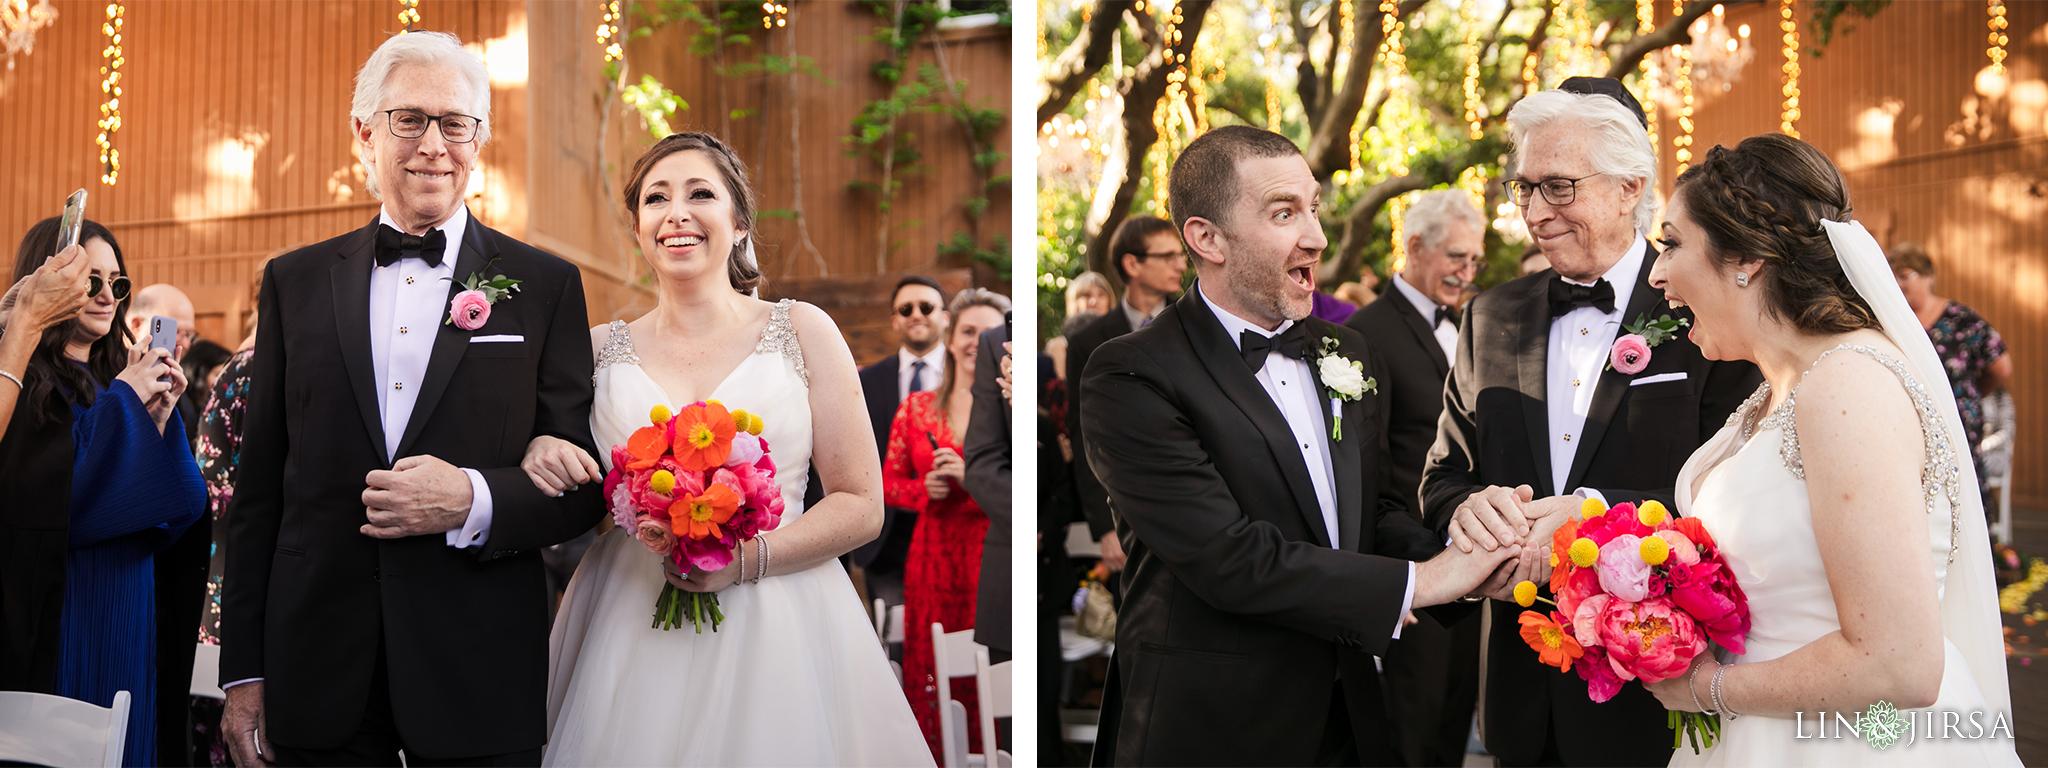 19 Calamigos Ranch Malibu Wedding Photography